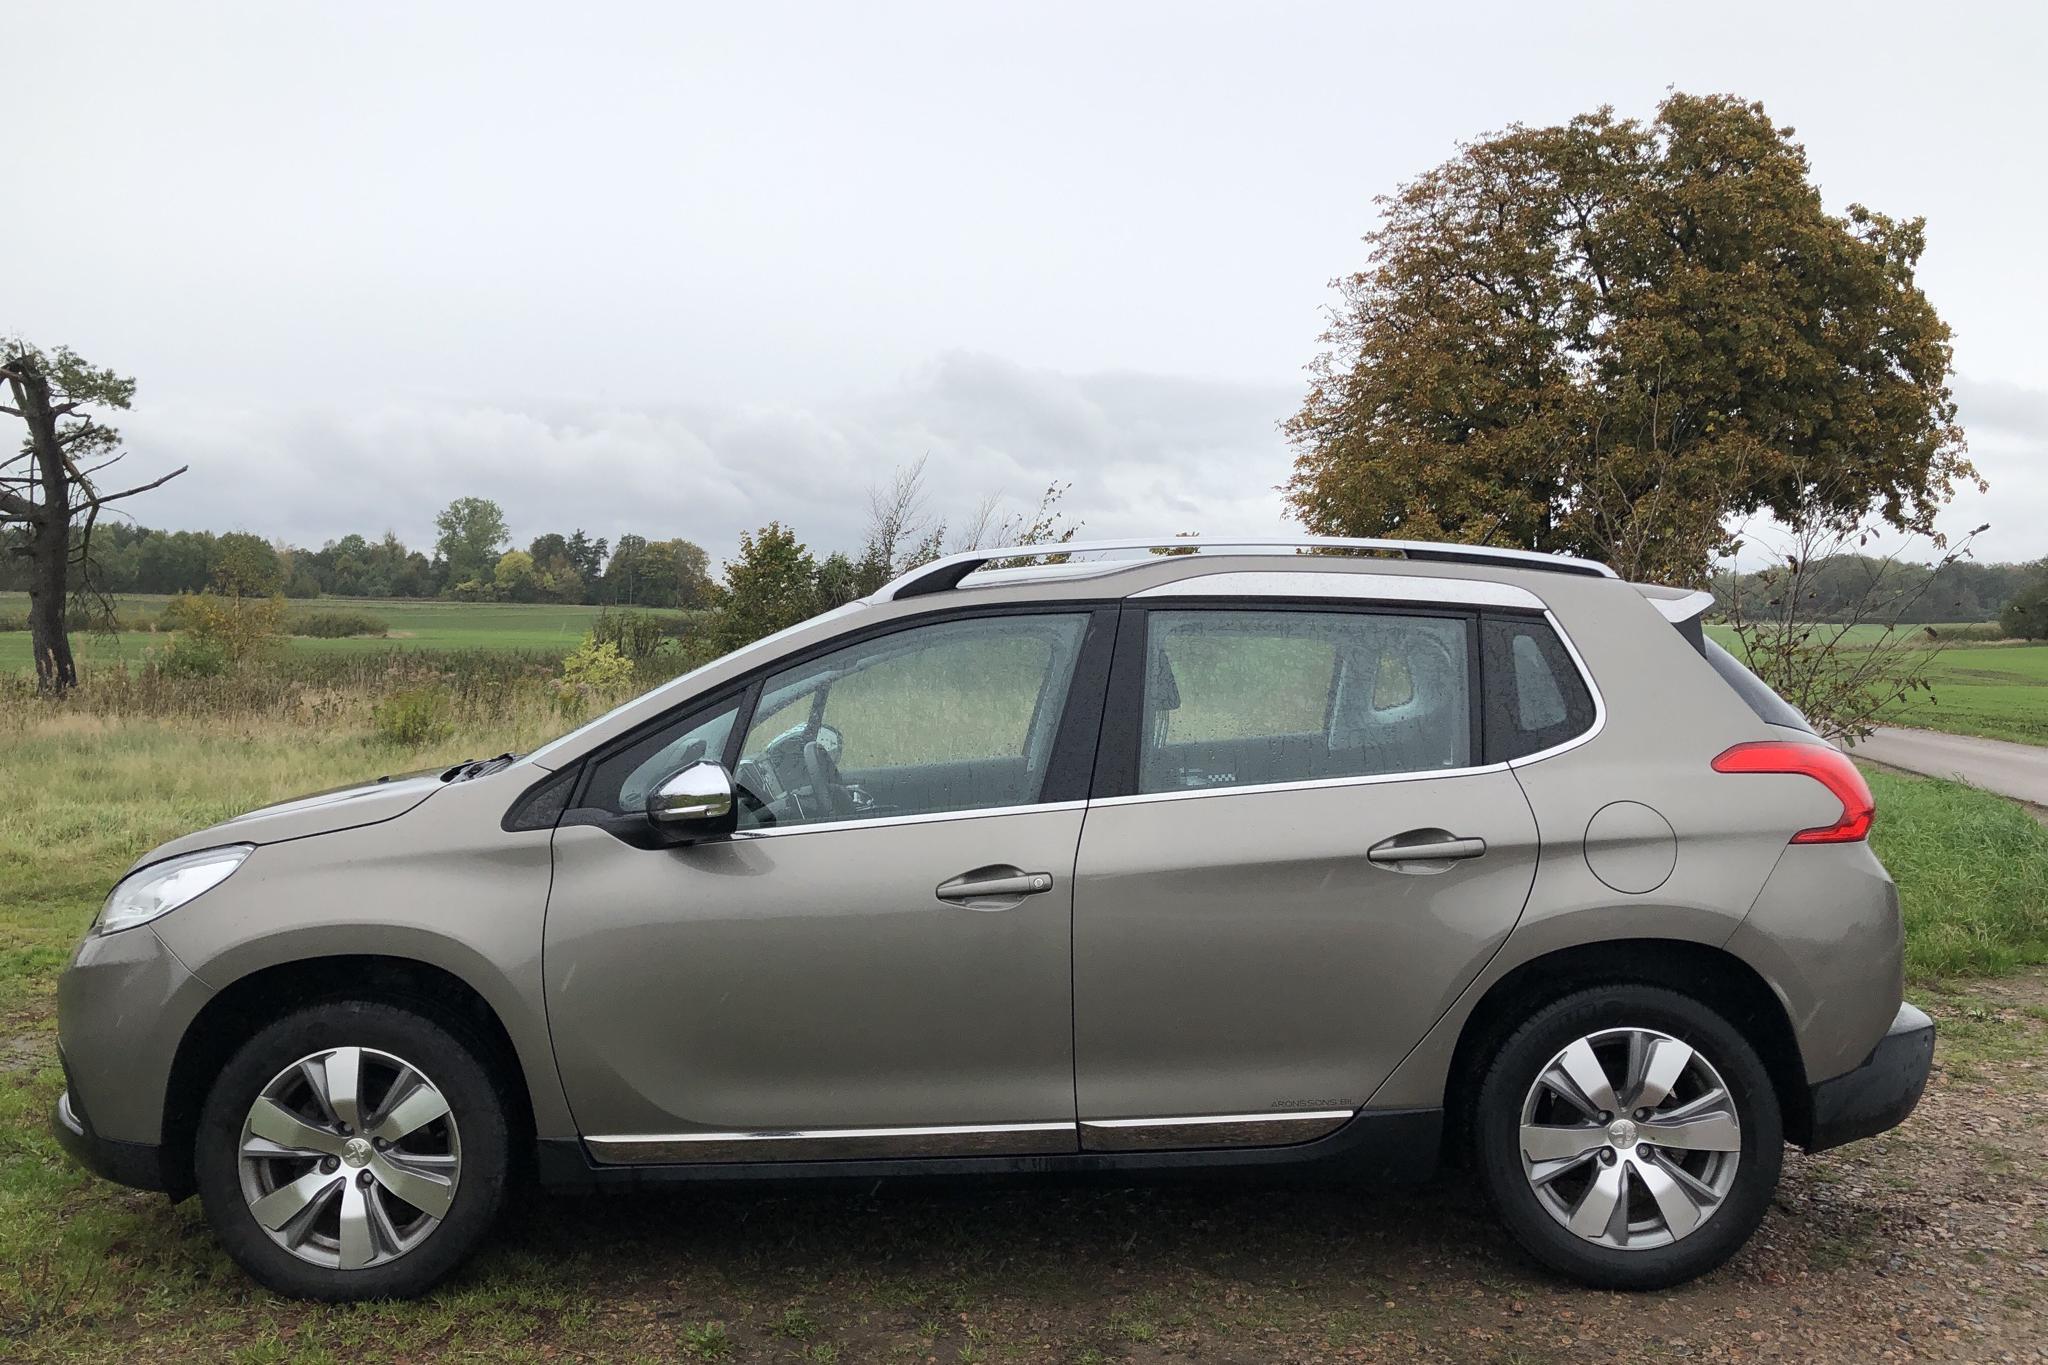 Peugeot 2008 1.2 VTi (82hk) - 17 720 km - Automatic - gray - 2016